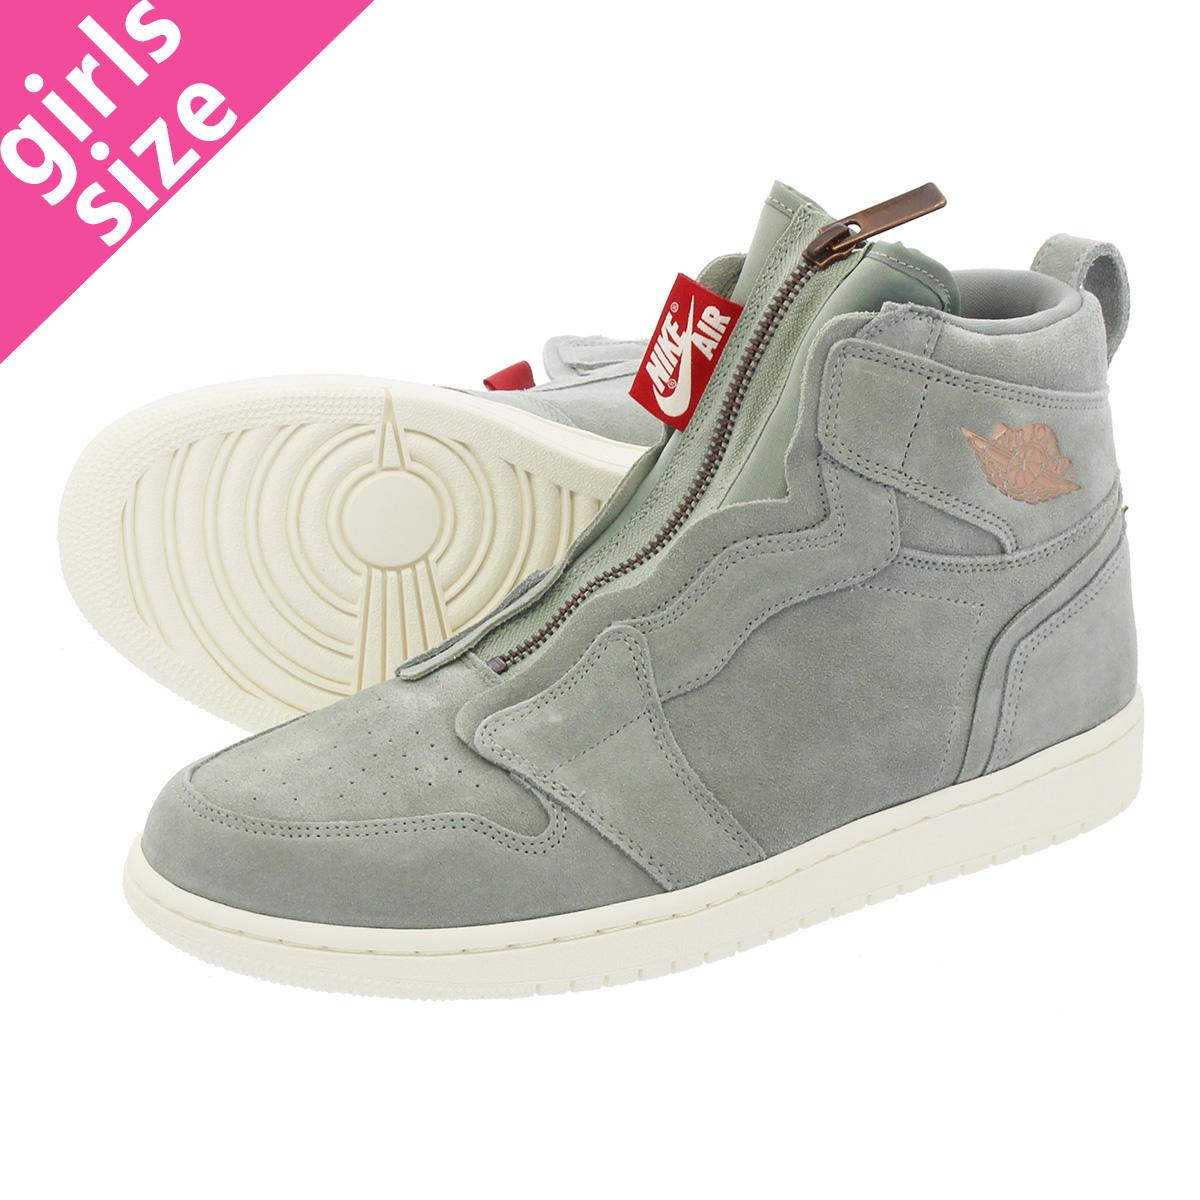 a6c498e13b25 LOWTEX PLUS  NIKE WMNS AIR JORDAN 1 HIGH ZIP Nike women Air Jordan 1 high  zip MICA GREEN METALLIC RED BRONZE aq3742-305-l